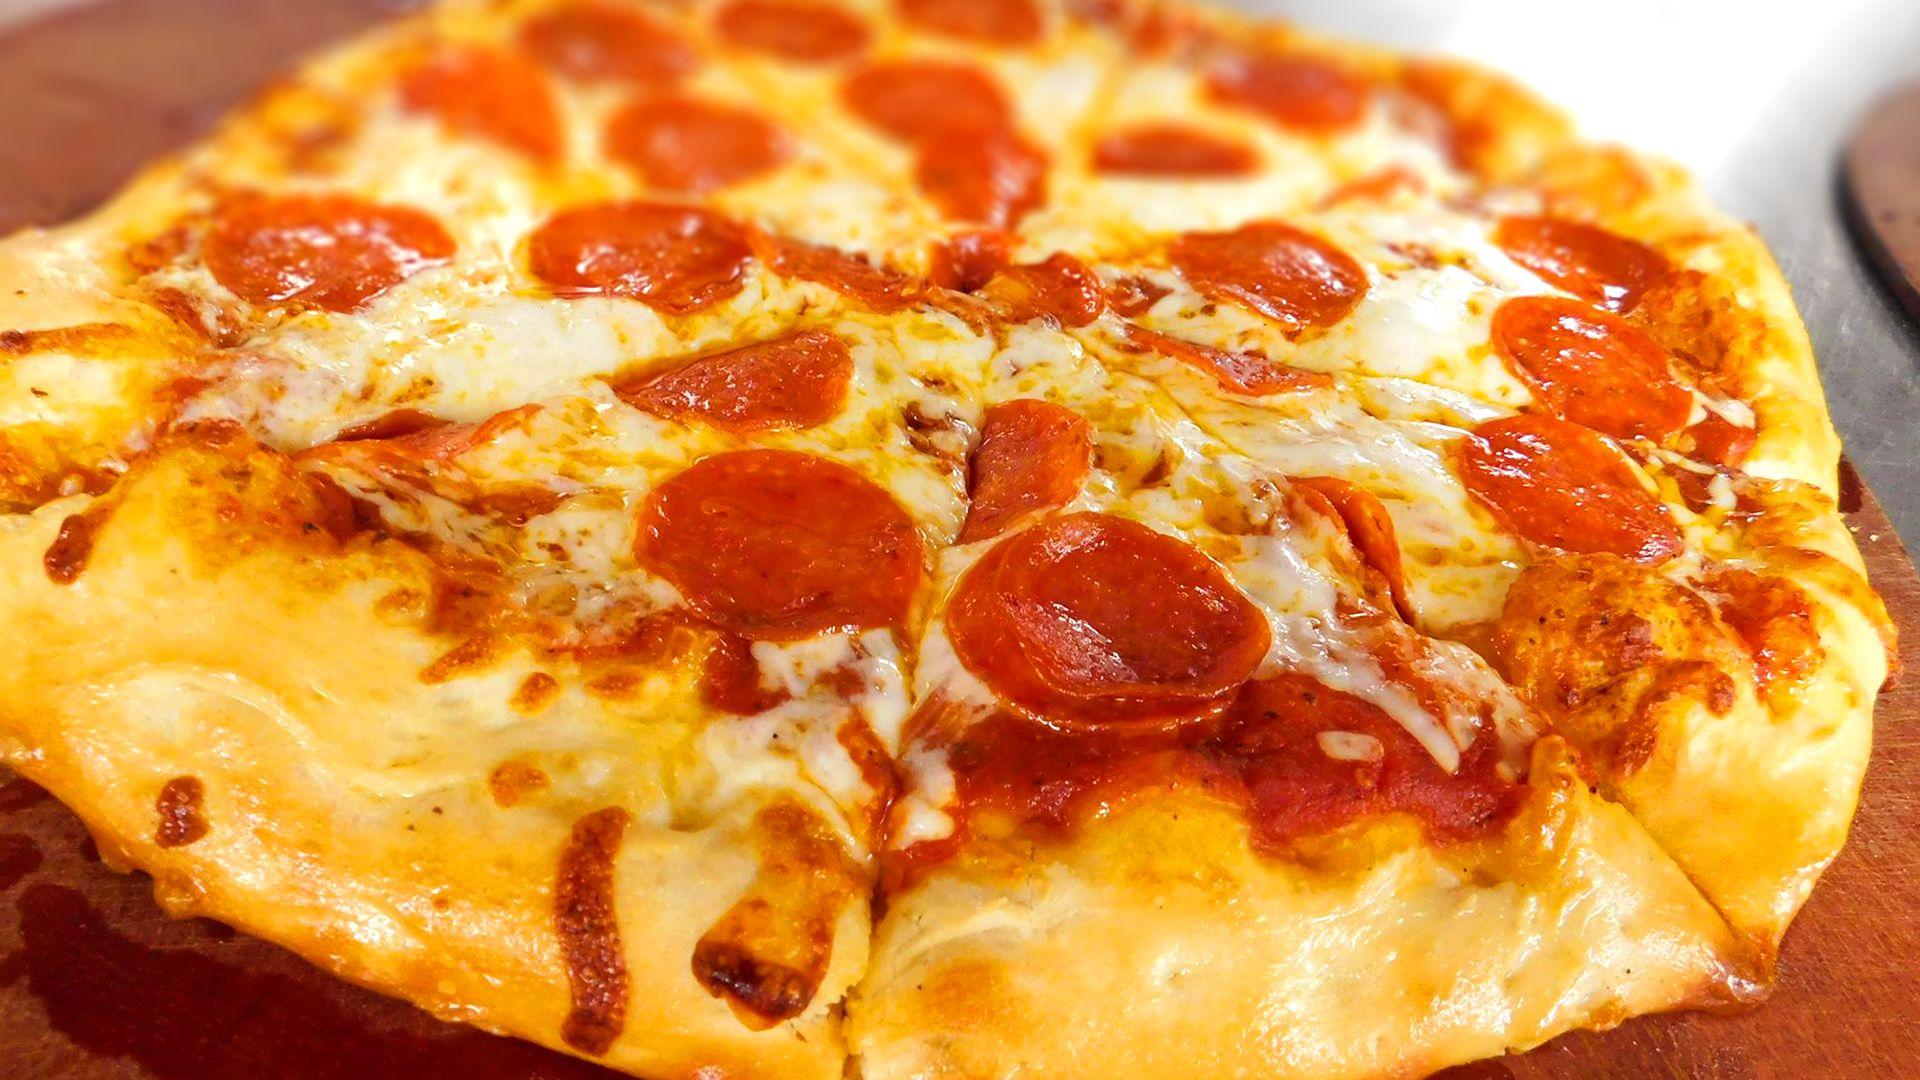 Shakopee Muddy Cow Bar In 2020 Pizza Special Fresh Food Shakopee